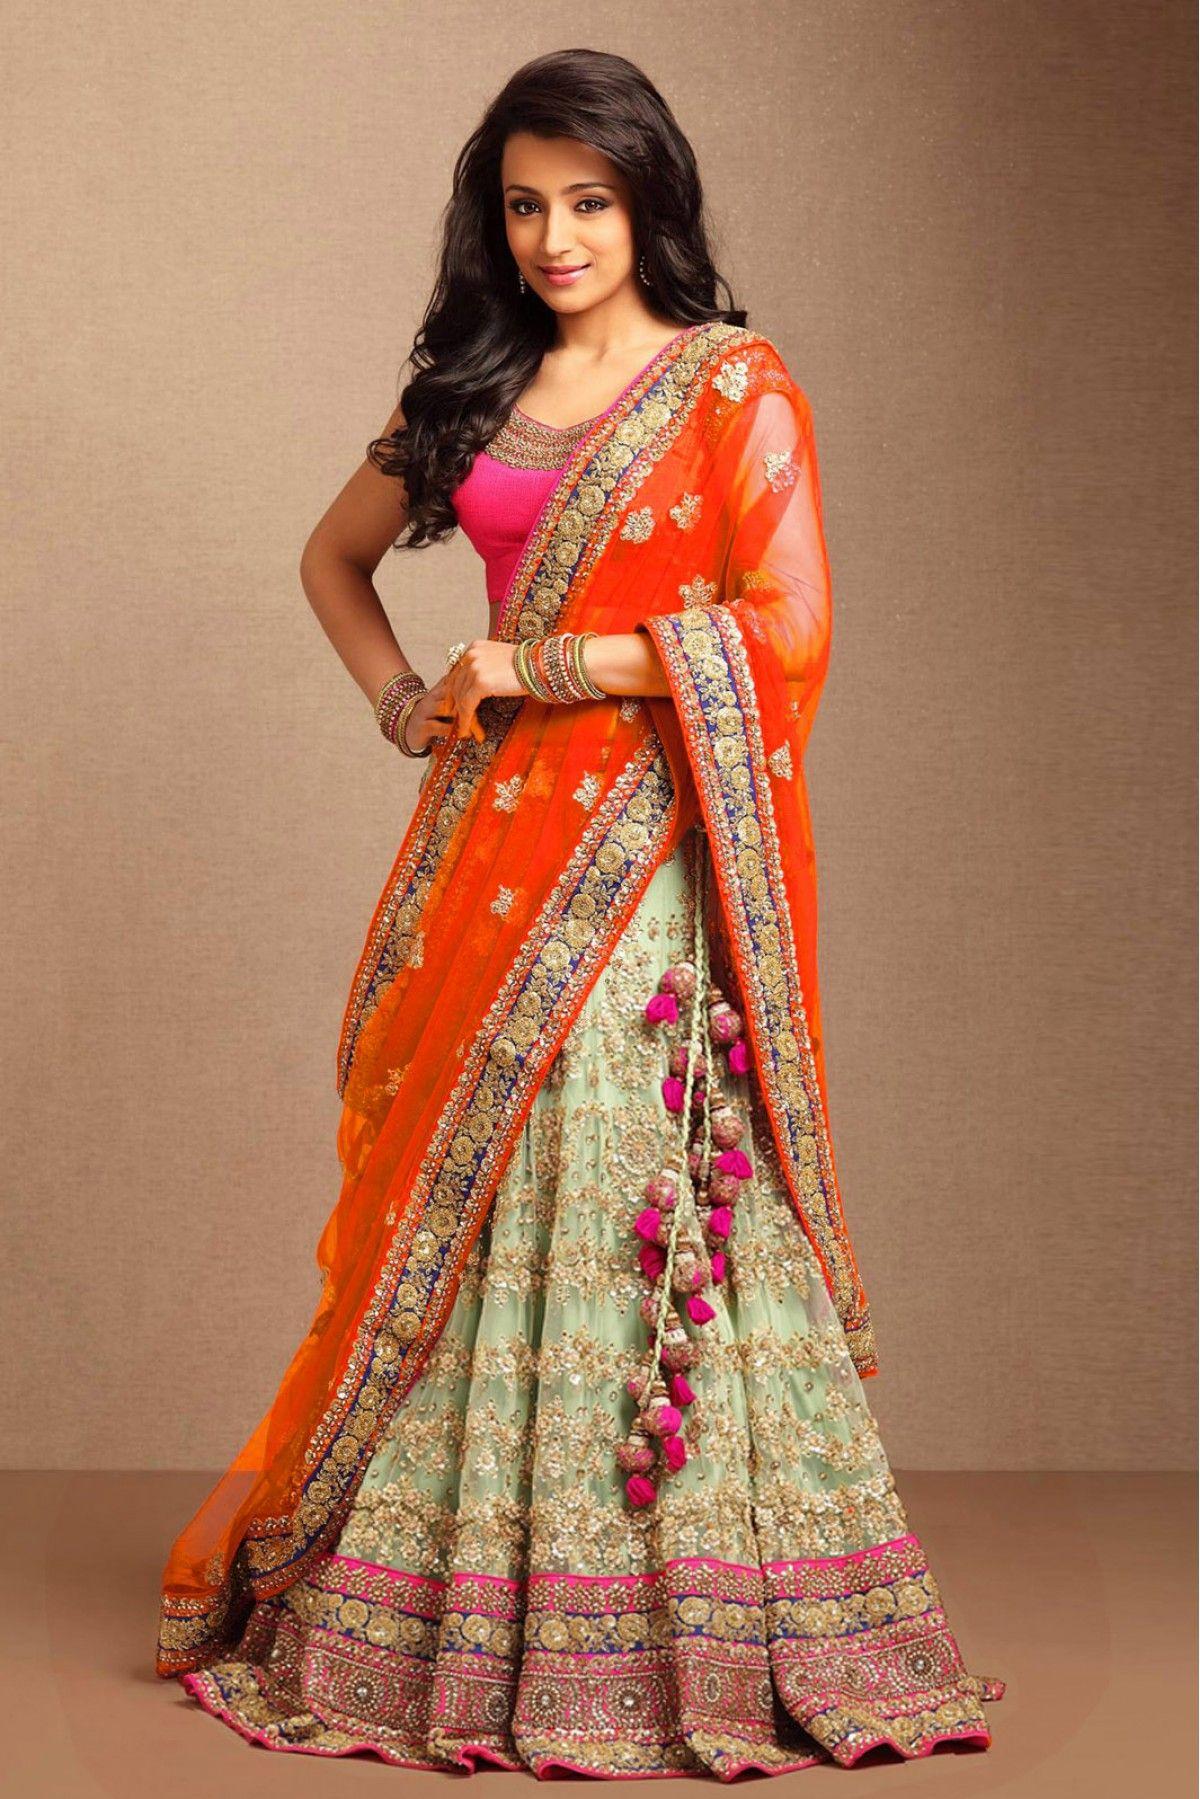 b632b747e6 Buy Trisha Krishnan Nylon Net Party Wear Lehenga Choli In Sea Green Colour  for women @ ninecolours.com. Worldwide Free Shipping Available!